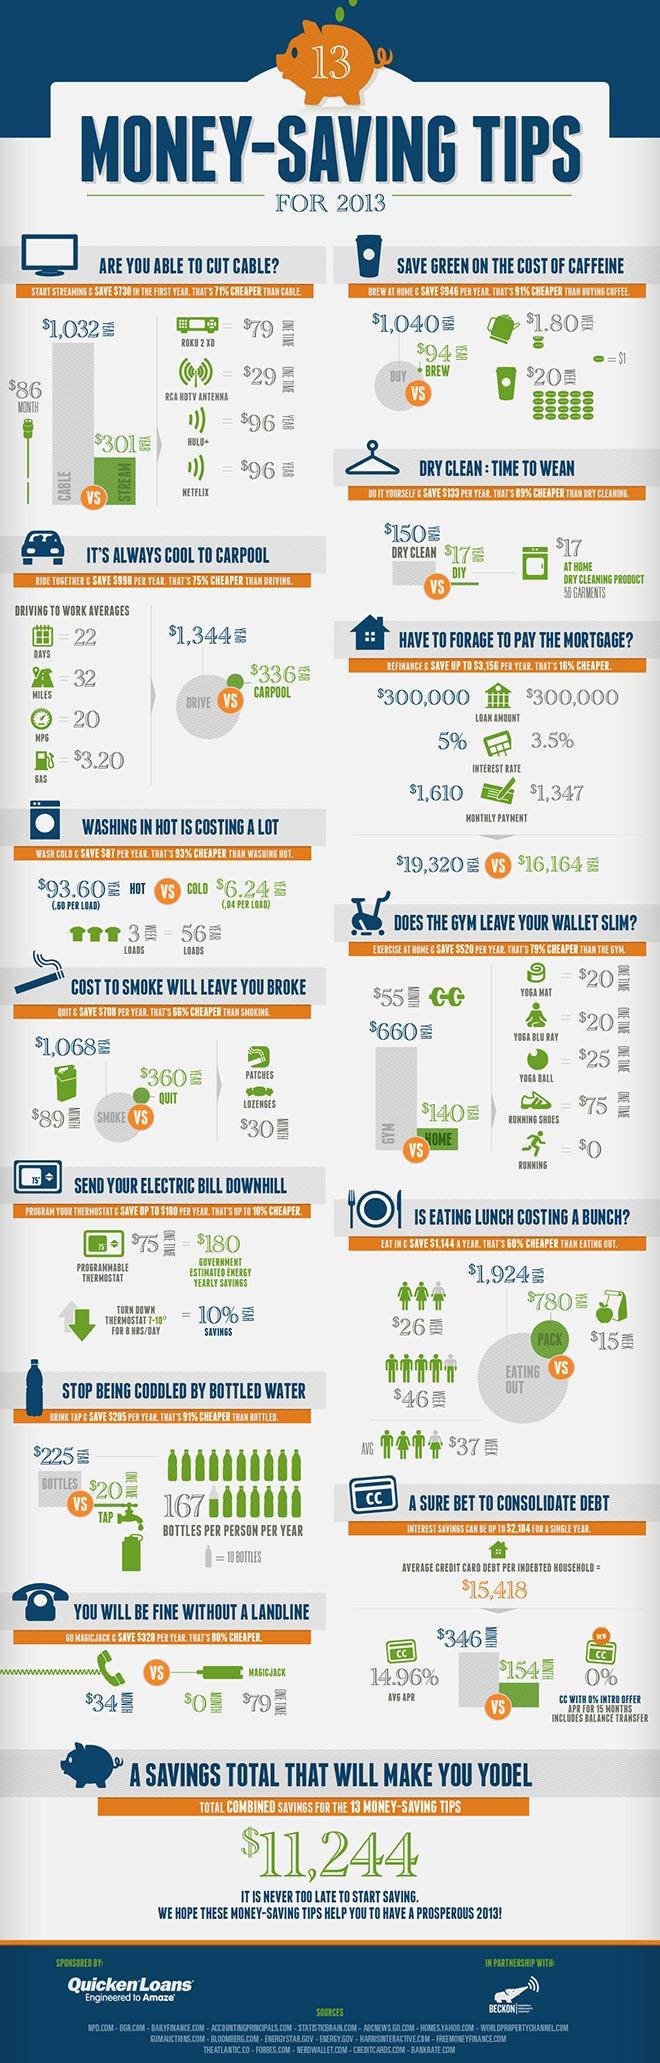 money saving tips web optimized 13 Money Saving Tips for 2013 Infographic